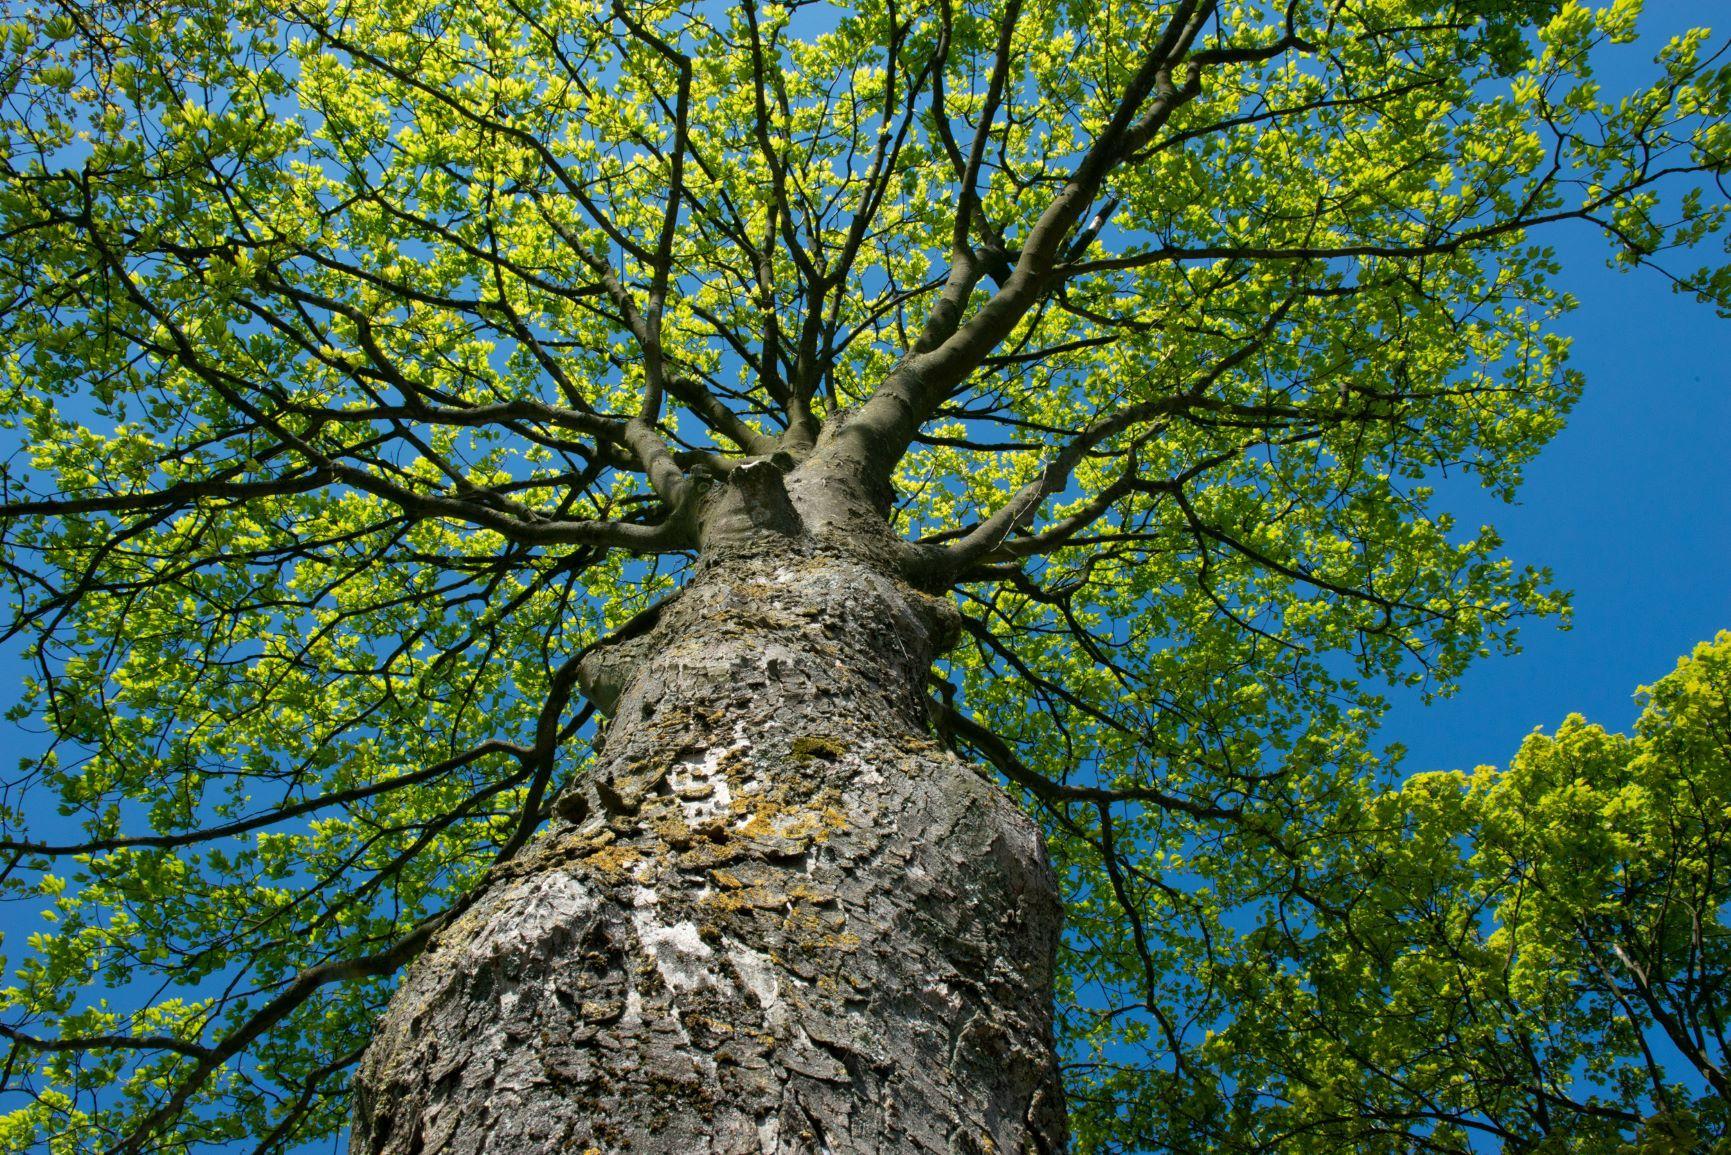 trees-for-all-groen-made-marketing-haarlem-duurzaamheid